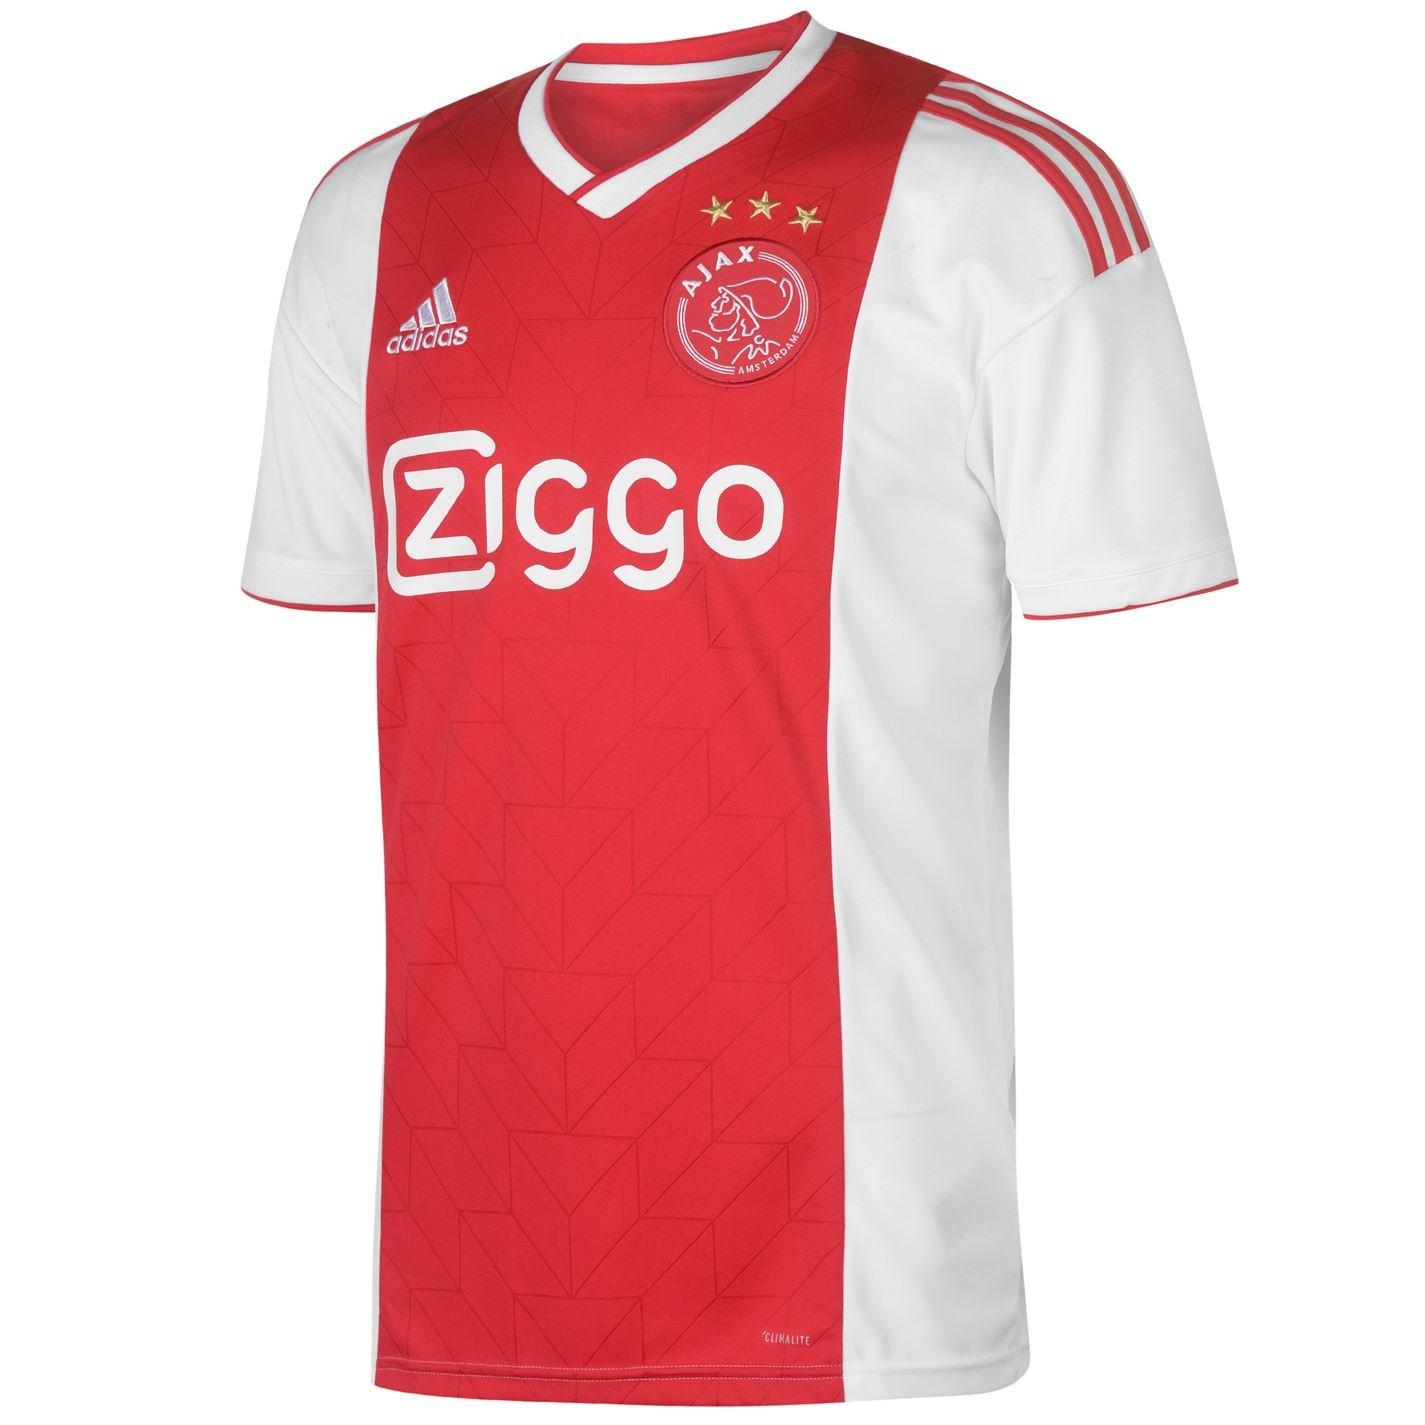 Adidas 2018-2019 Ajax Home Football Shirt